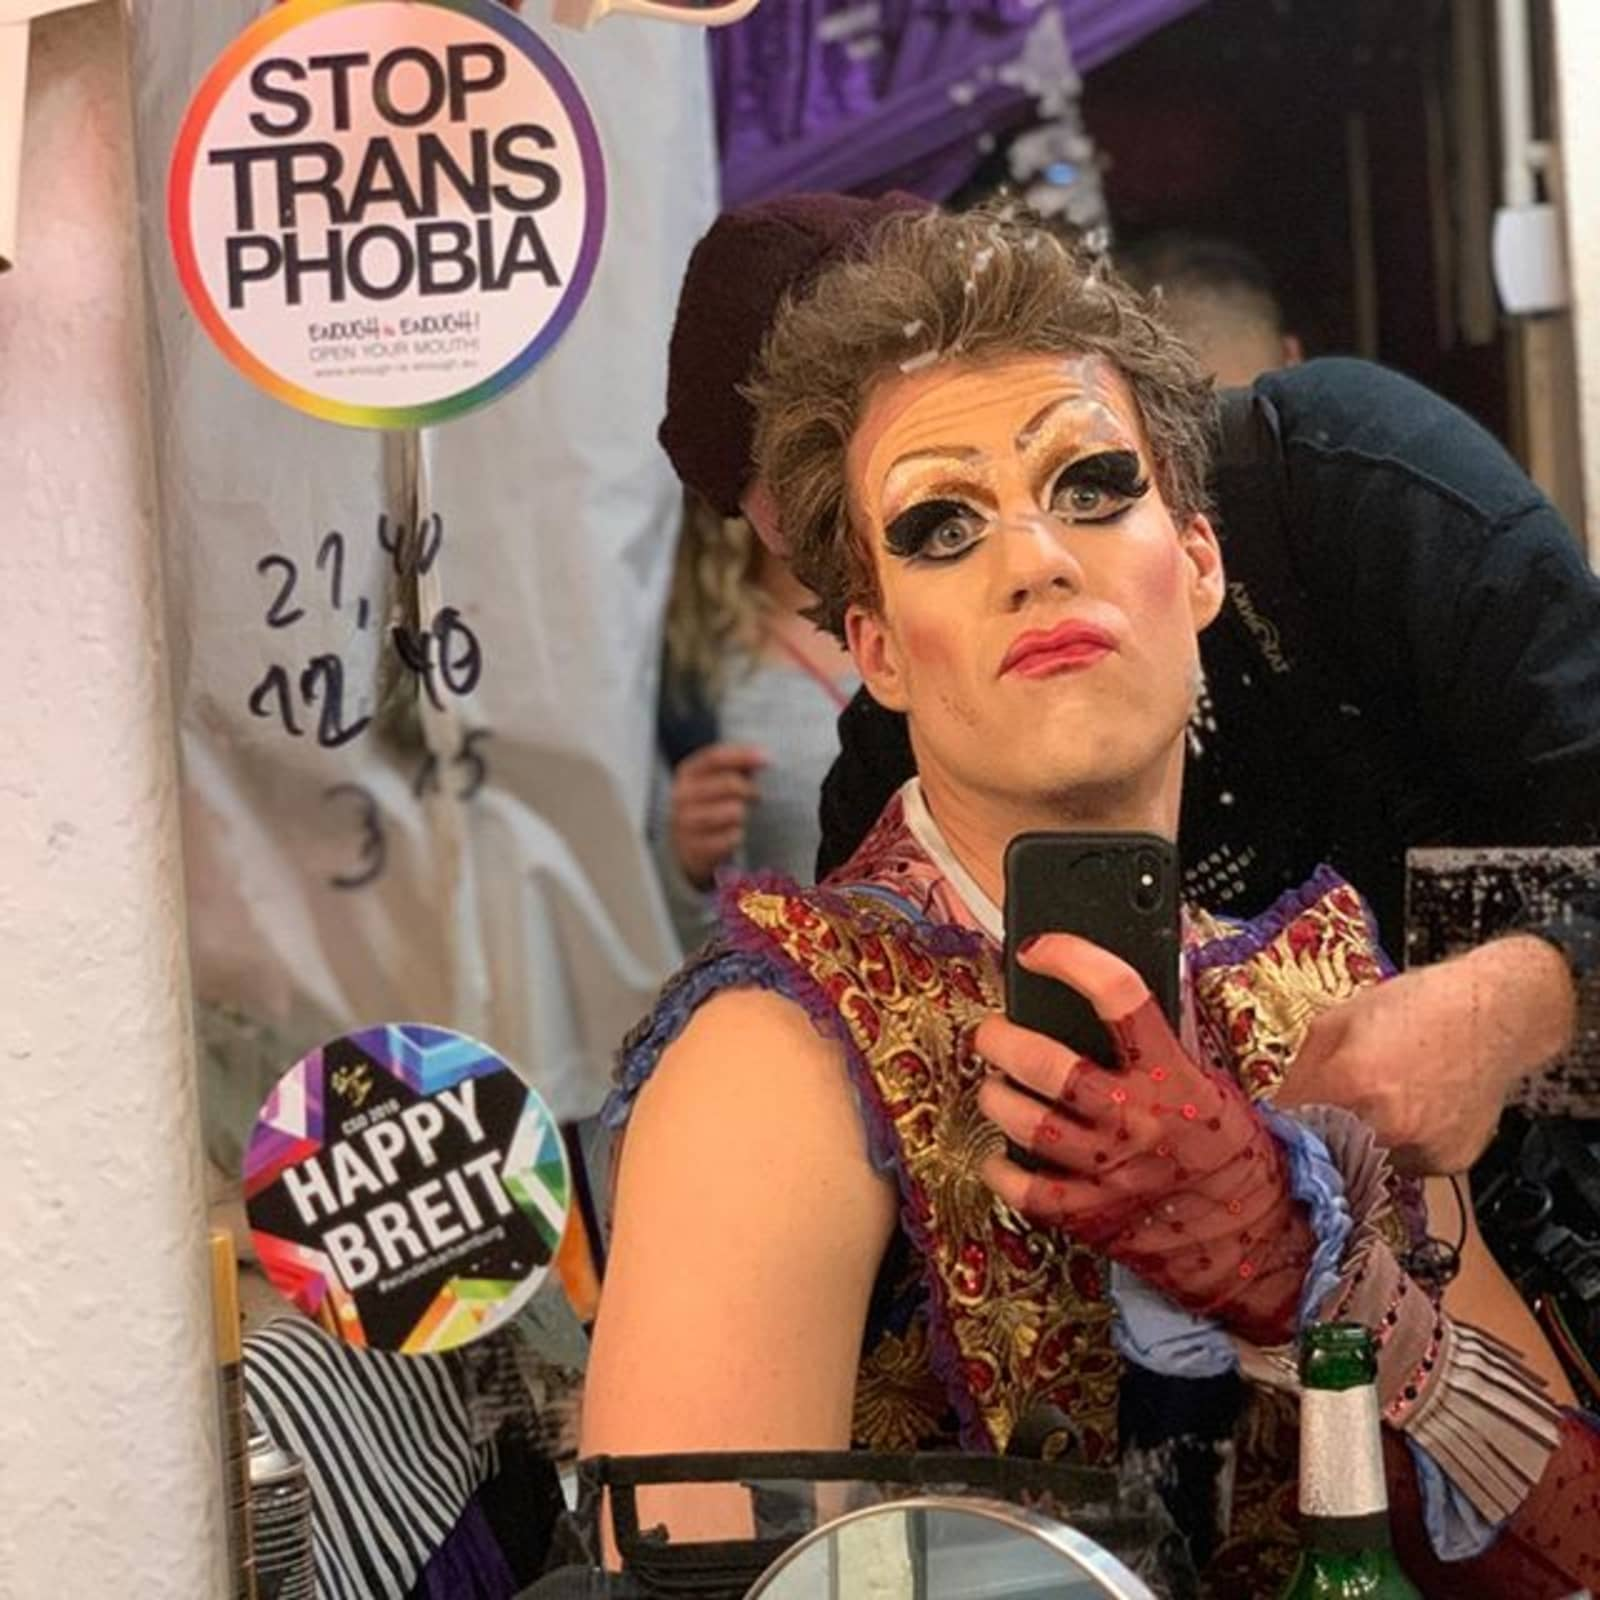 Luke Mockridge zeigt sich als Drag Queen